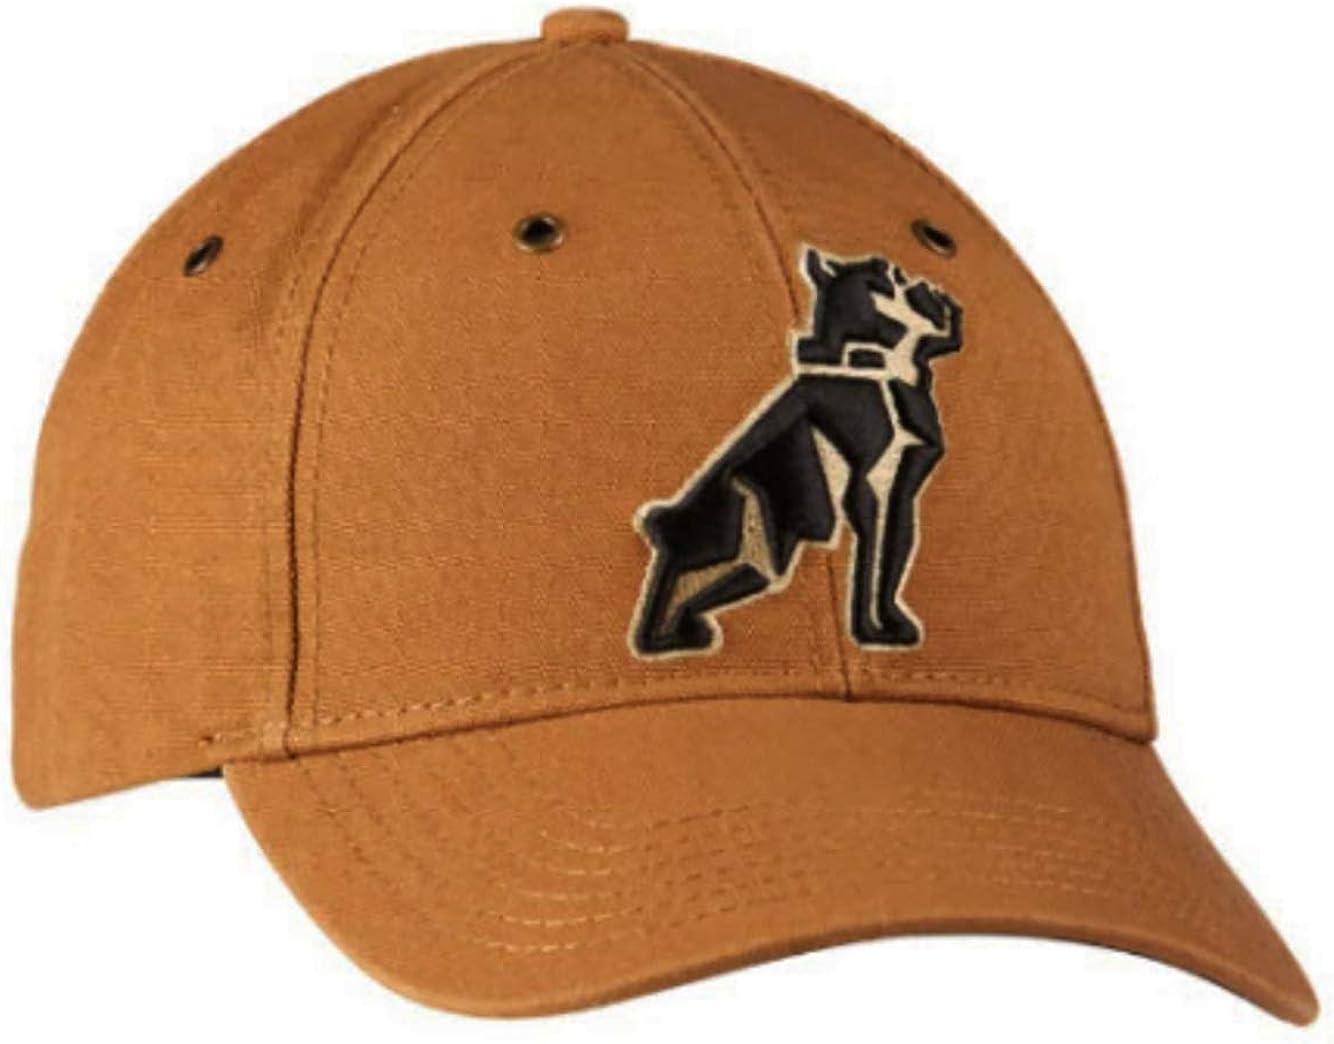 Mack Trucks Tan & Black Canvas Embroidered Bulldog Logo Hat/Cap